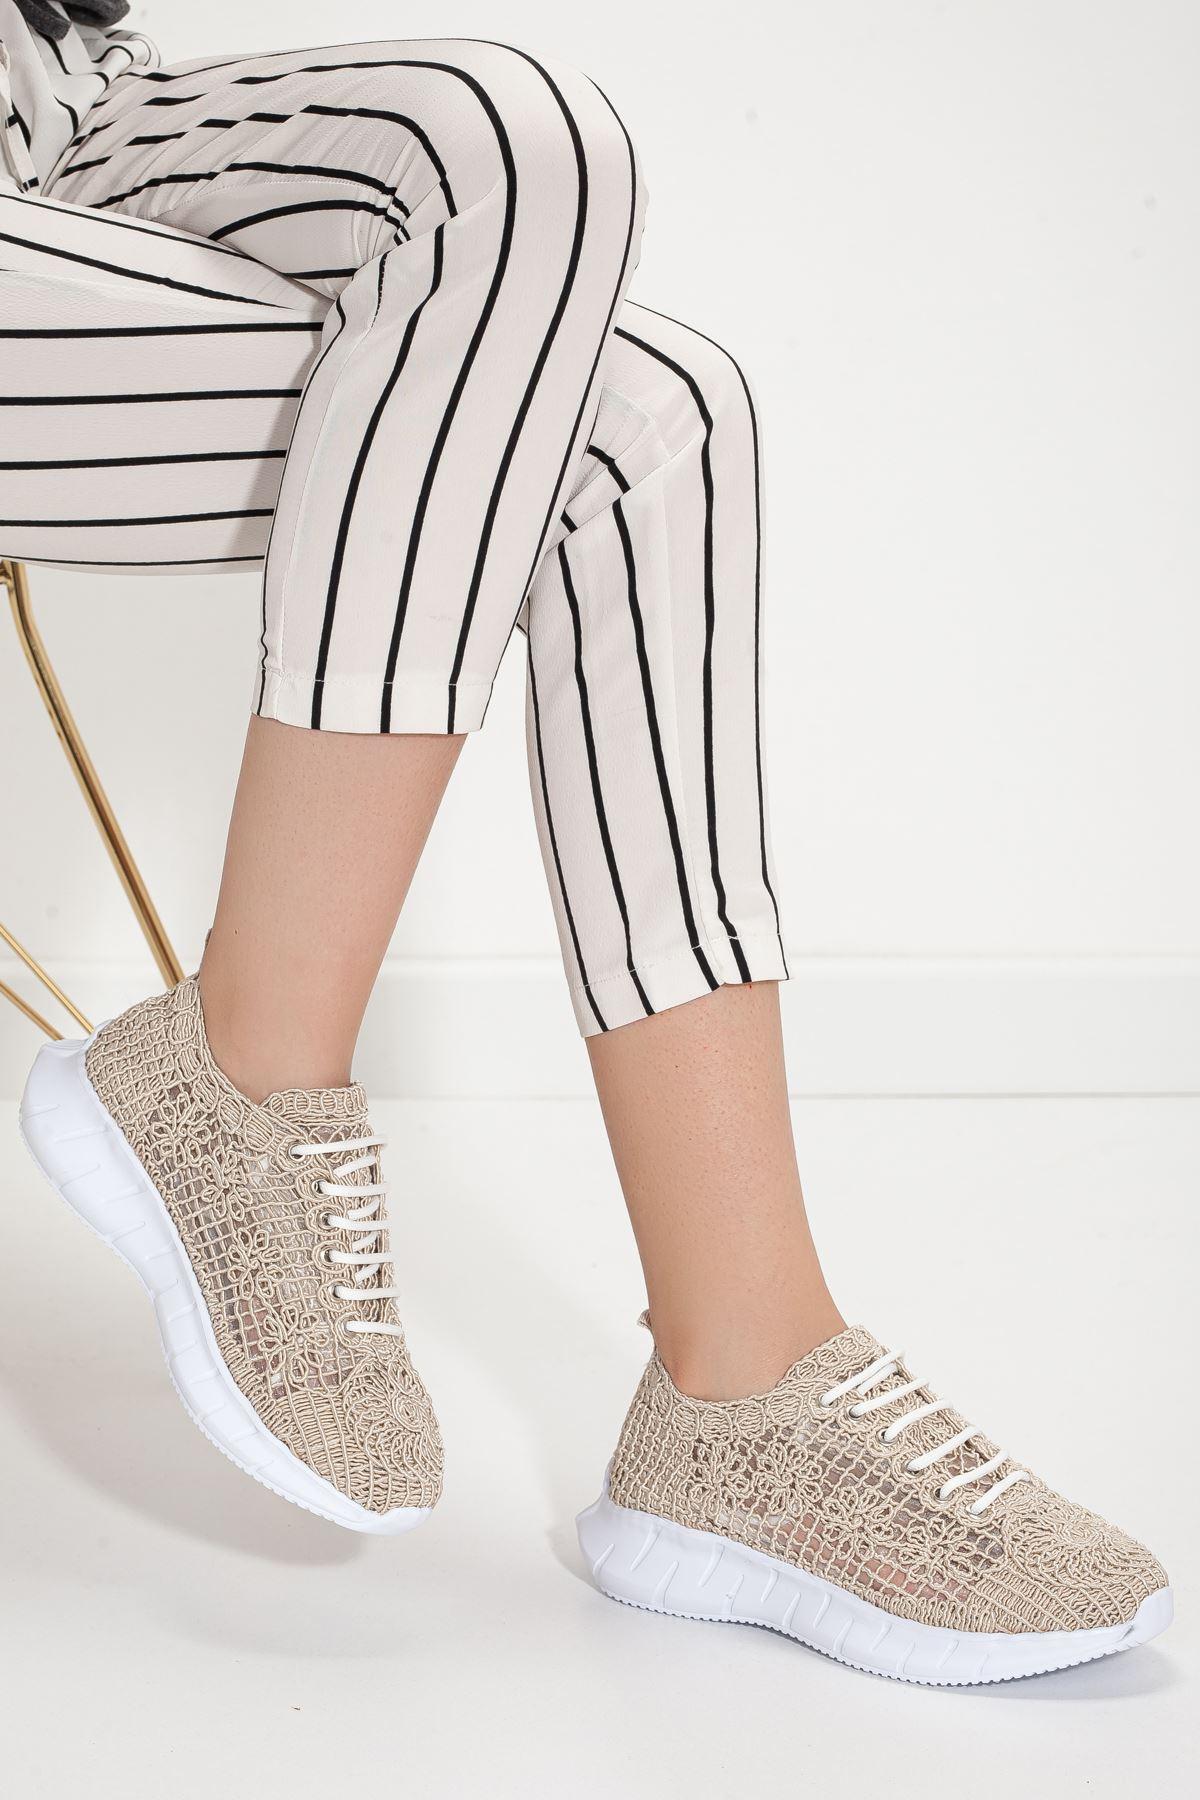 stello spor ayakkabı Ten